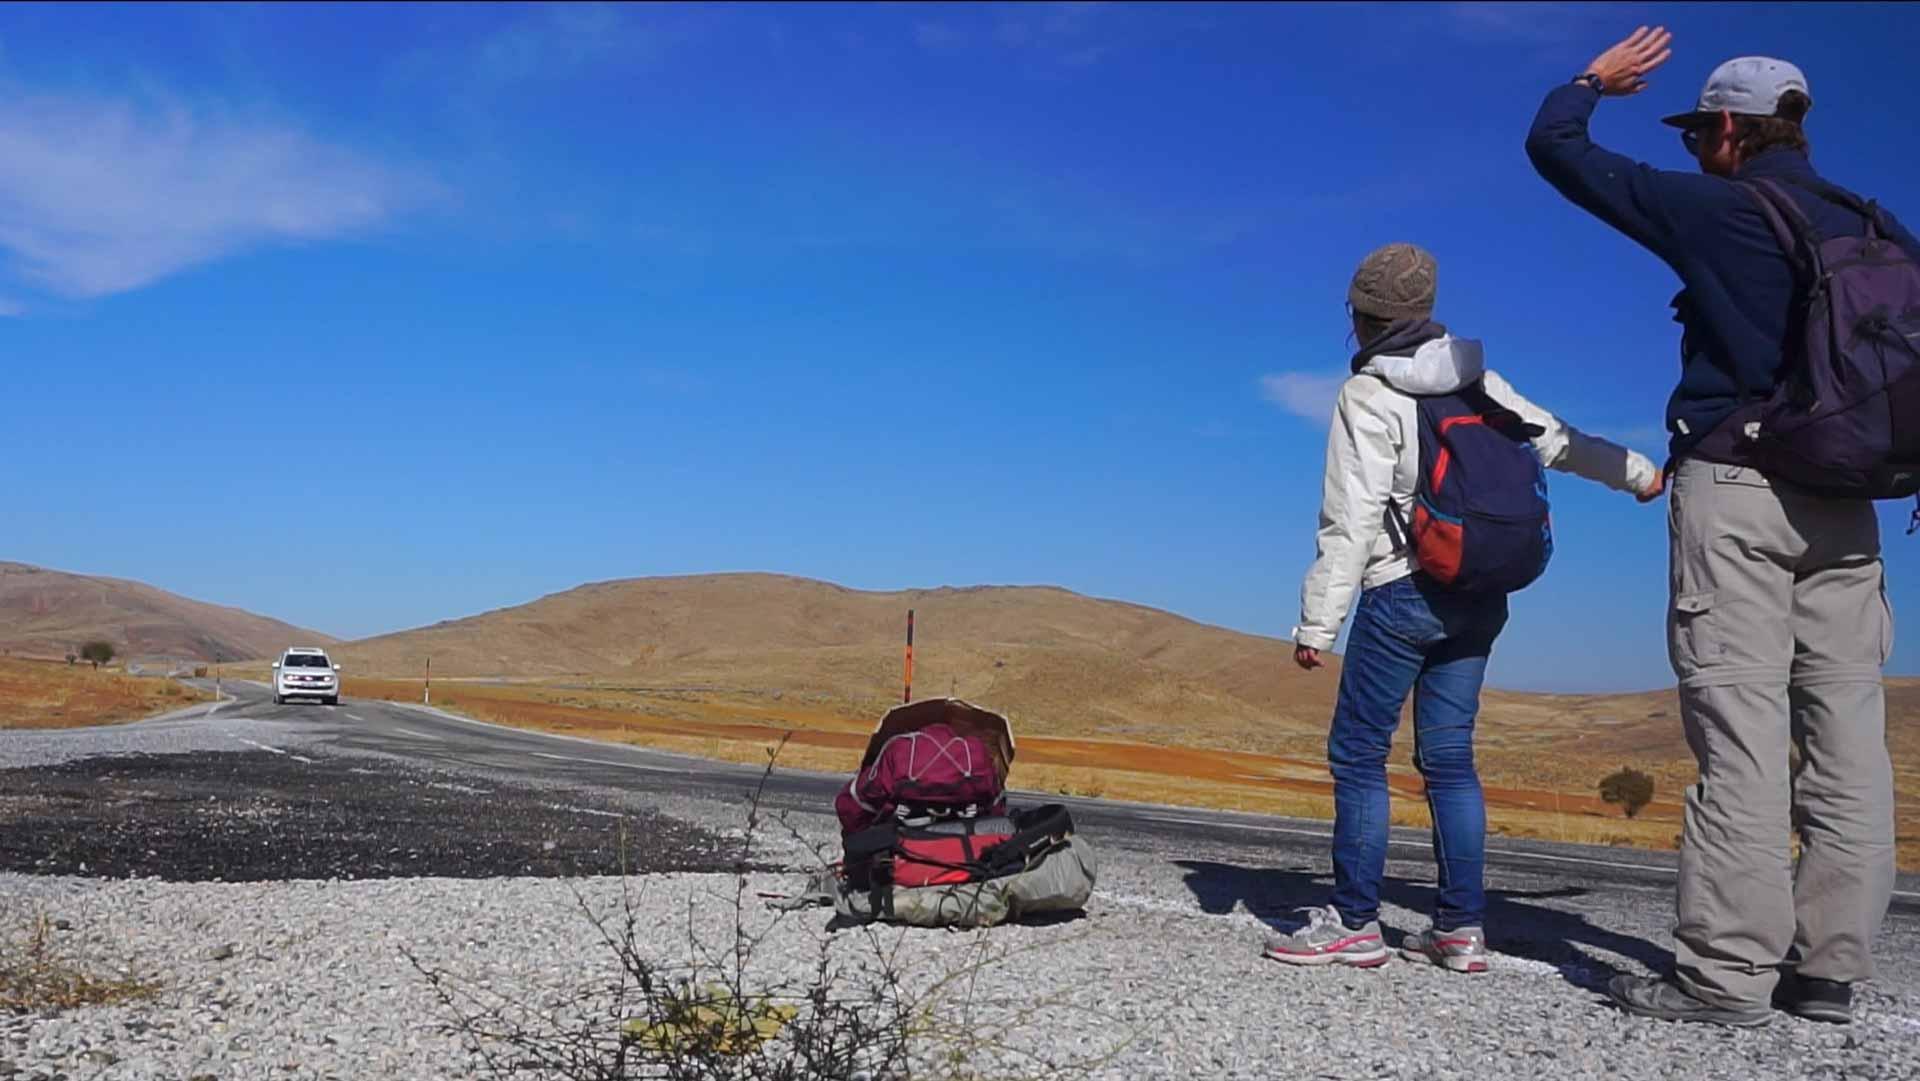 guide experience serialhikers tour du monde world trip voyage alternatif autostop hitchhiking volontariat volonteering adventure aventure